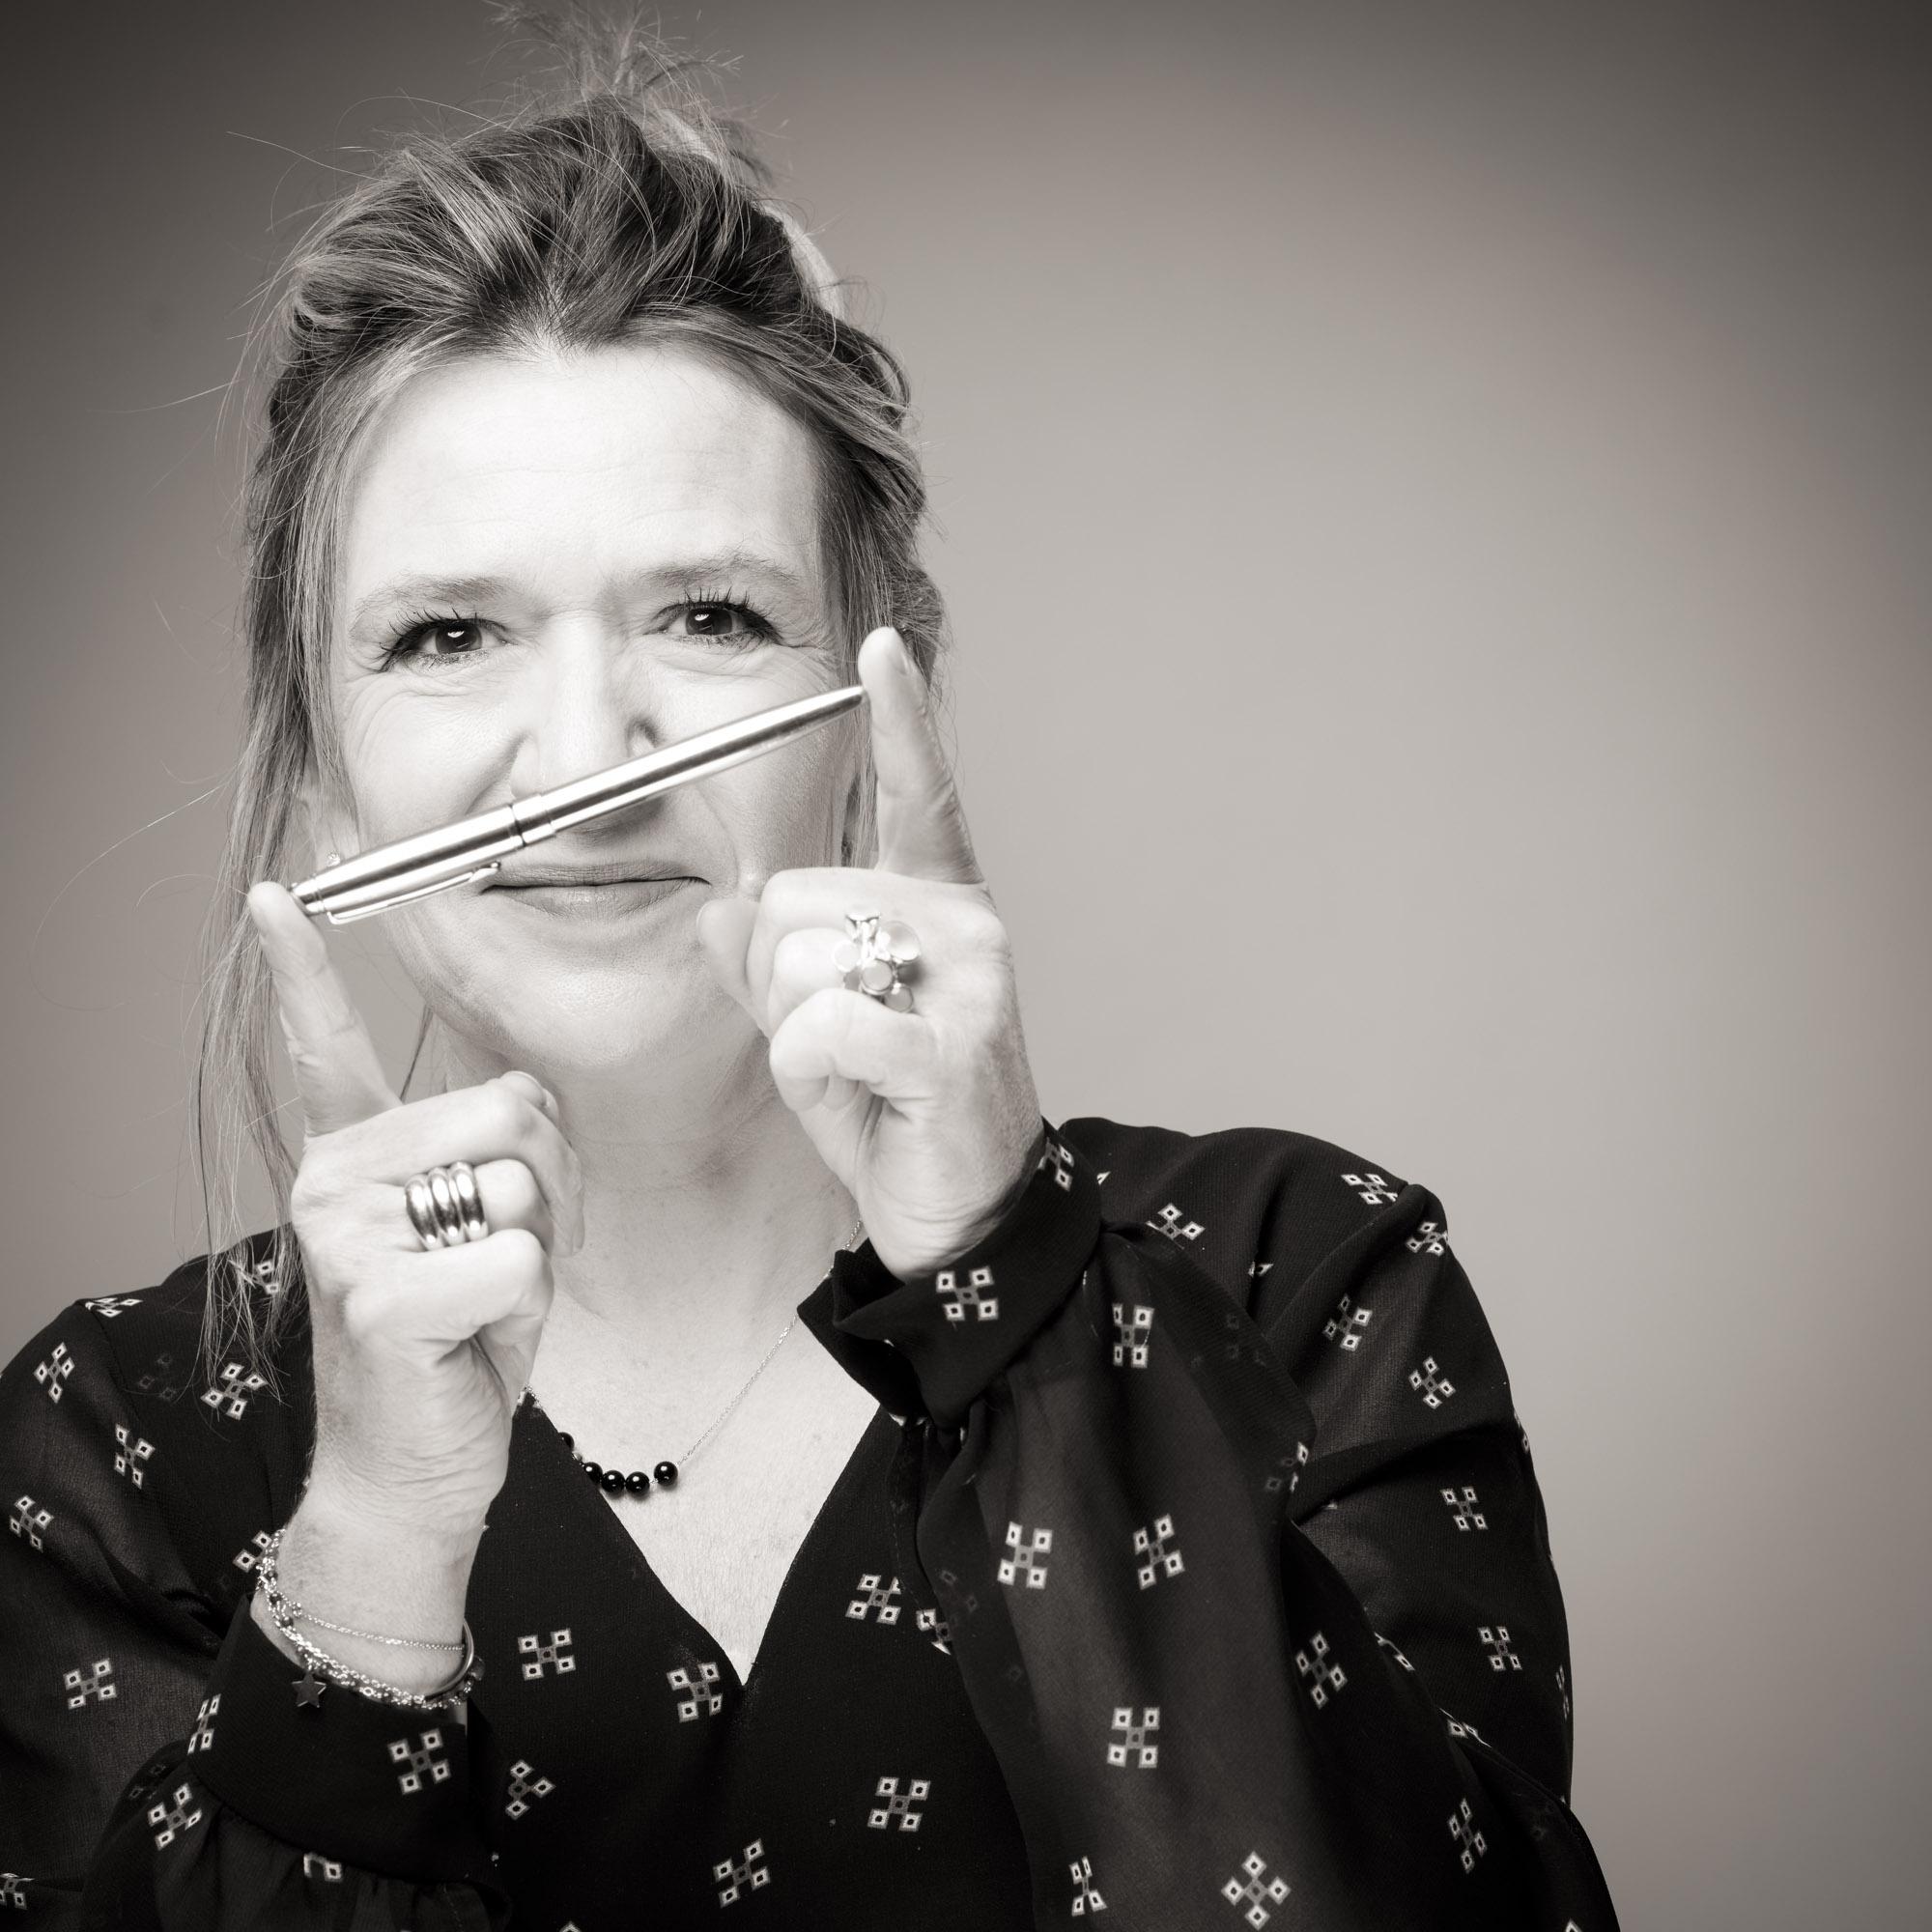 Catherine Delaby jouant avec un stylo